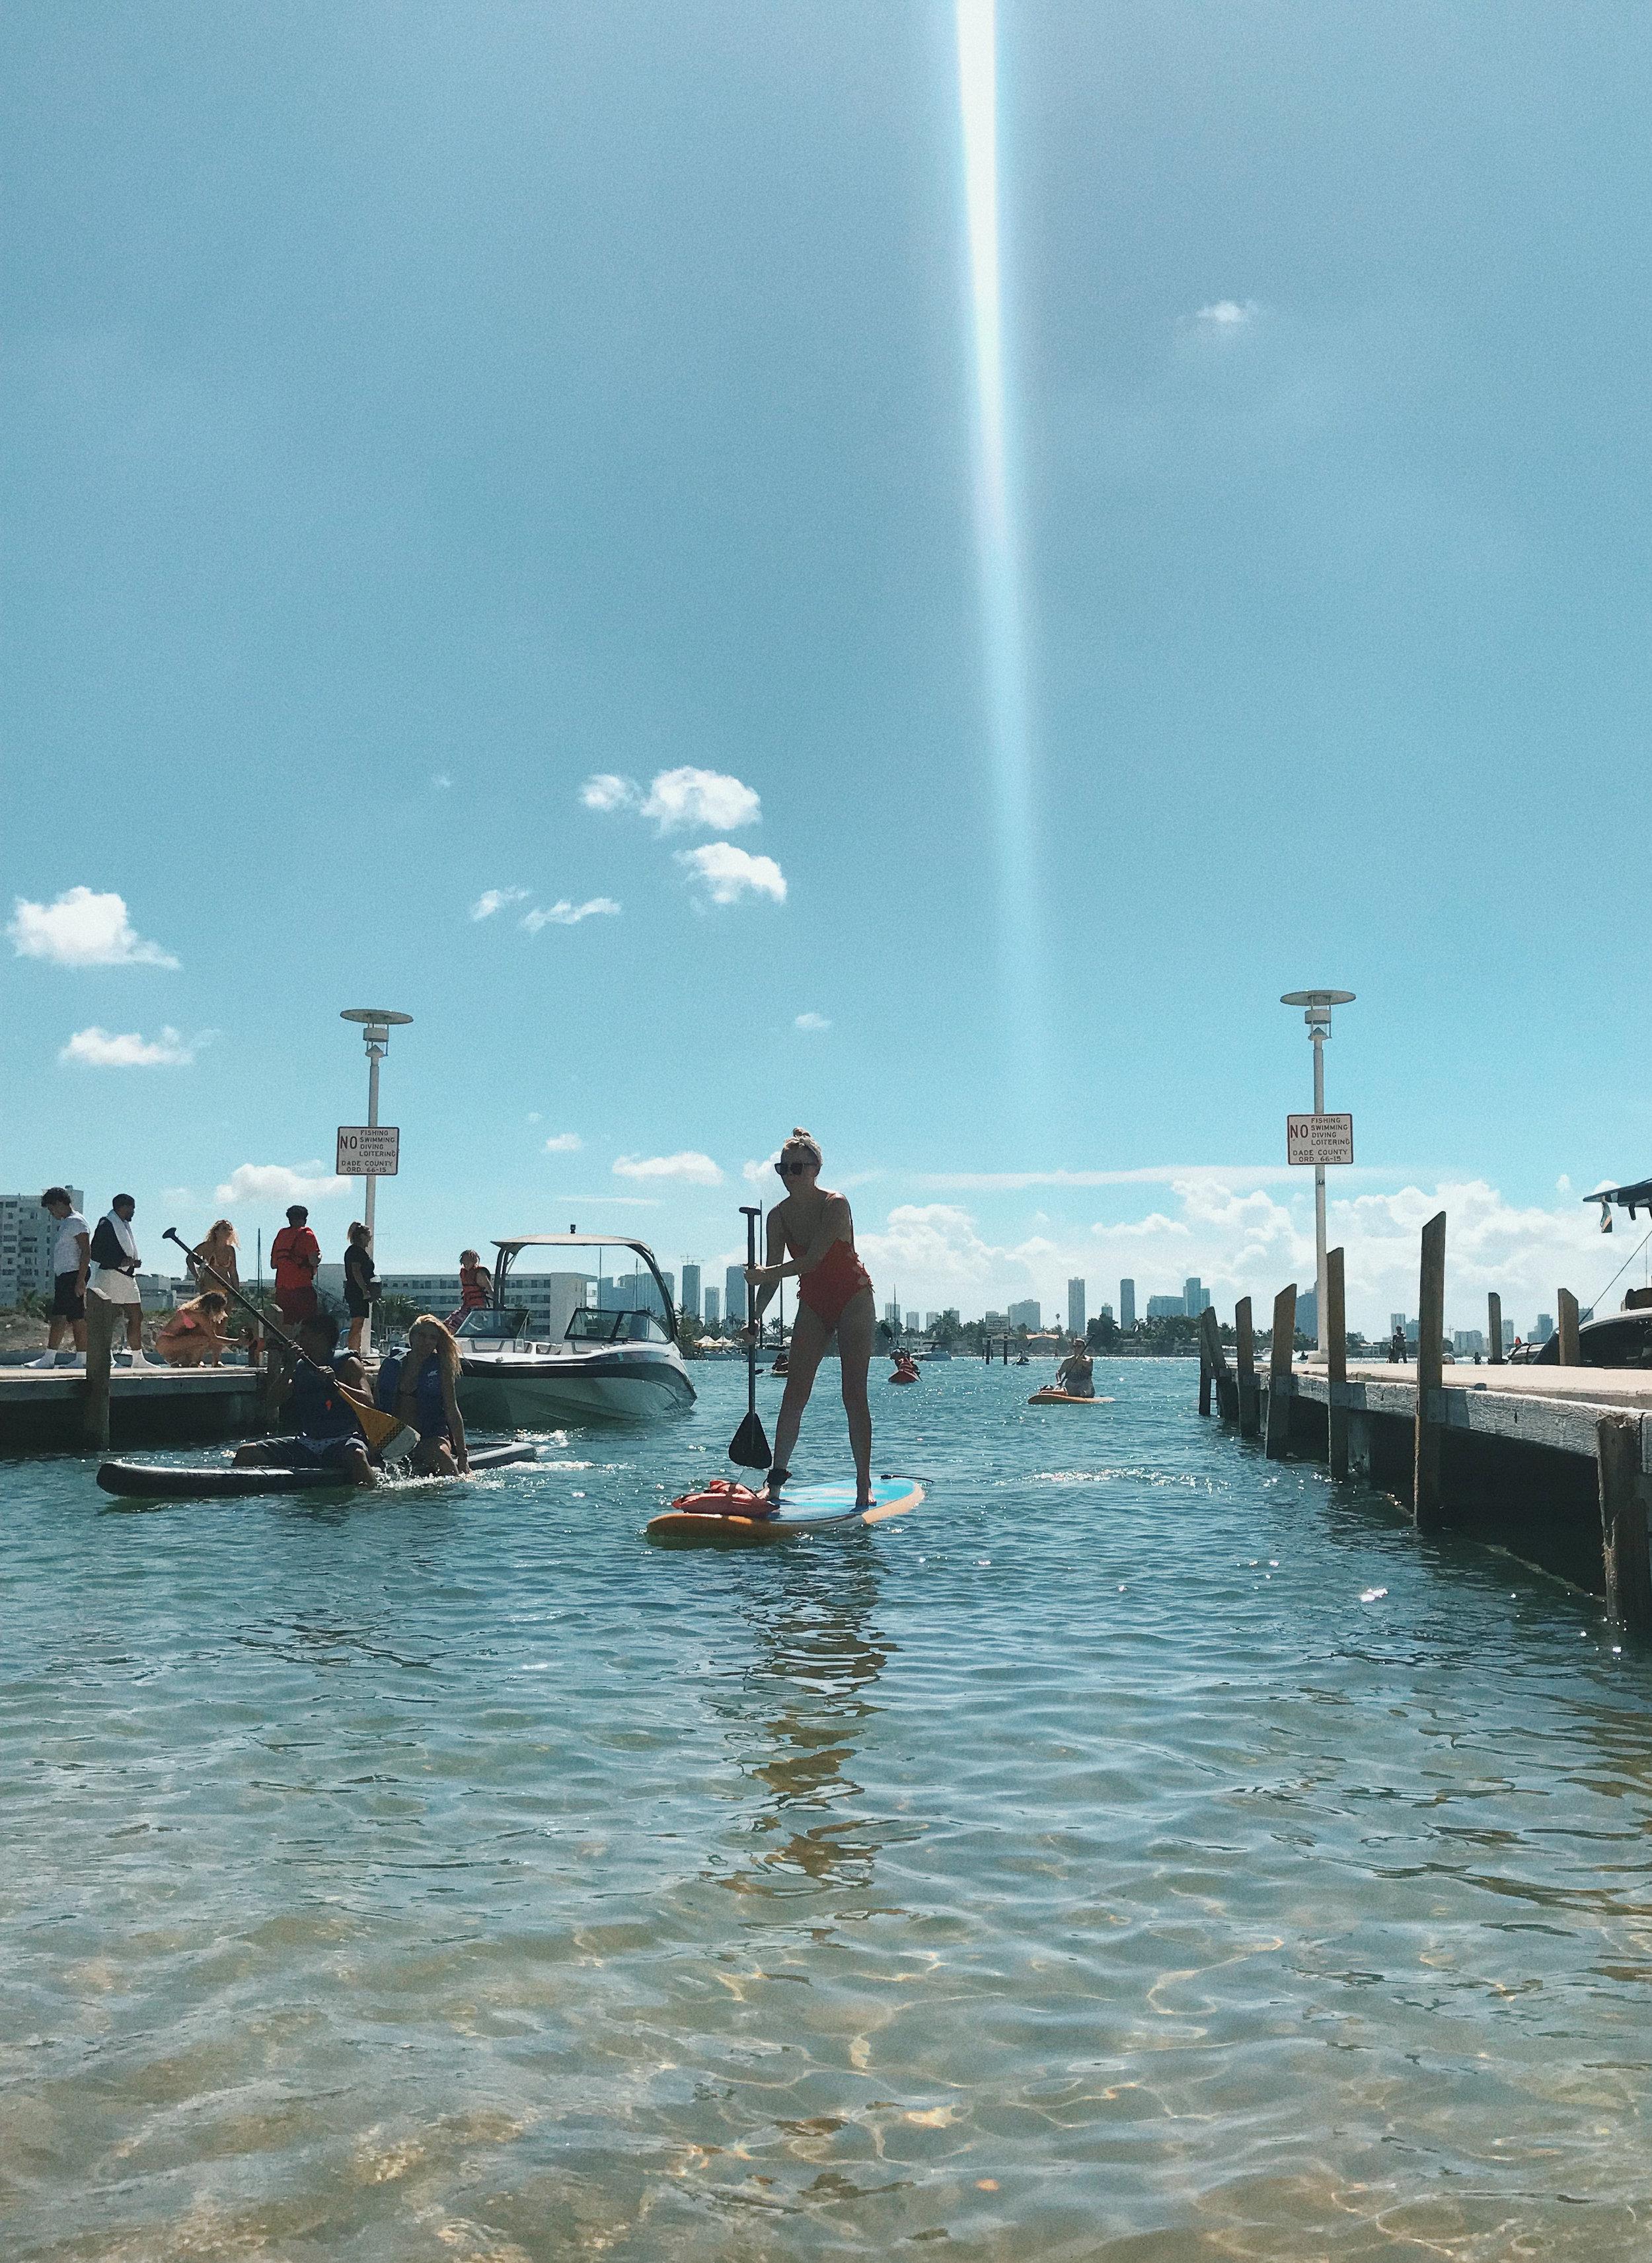 20180805_South Beach Kayak - Miami Beach Paddle Board_5.jpg